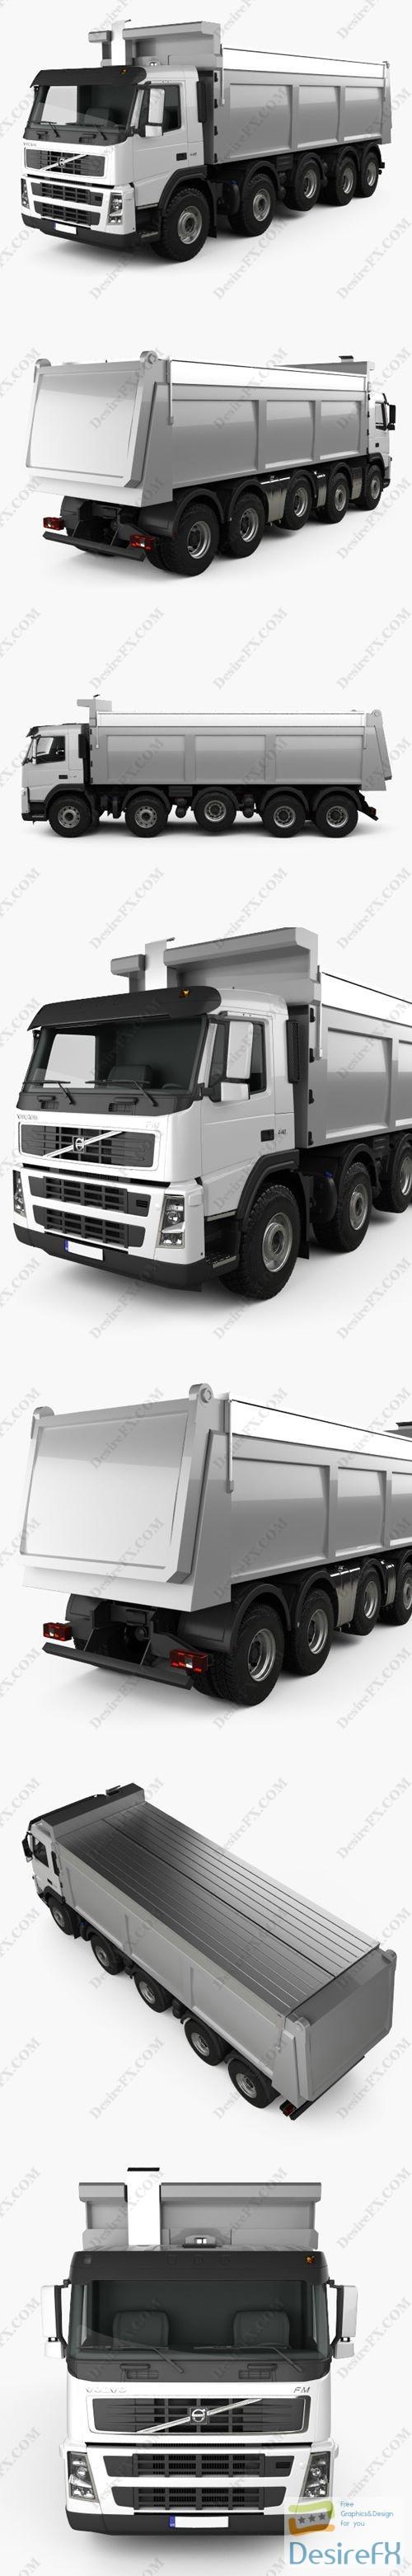 Volvo FM Truck 10x4 Dumper 2010 3D Model